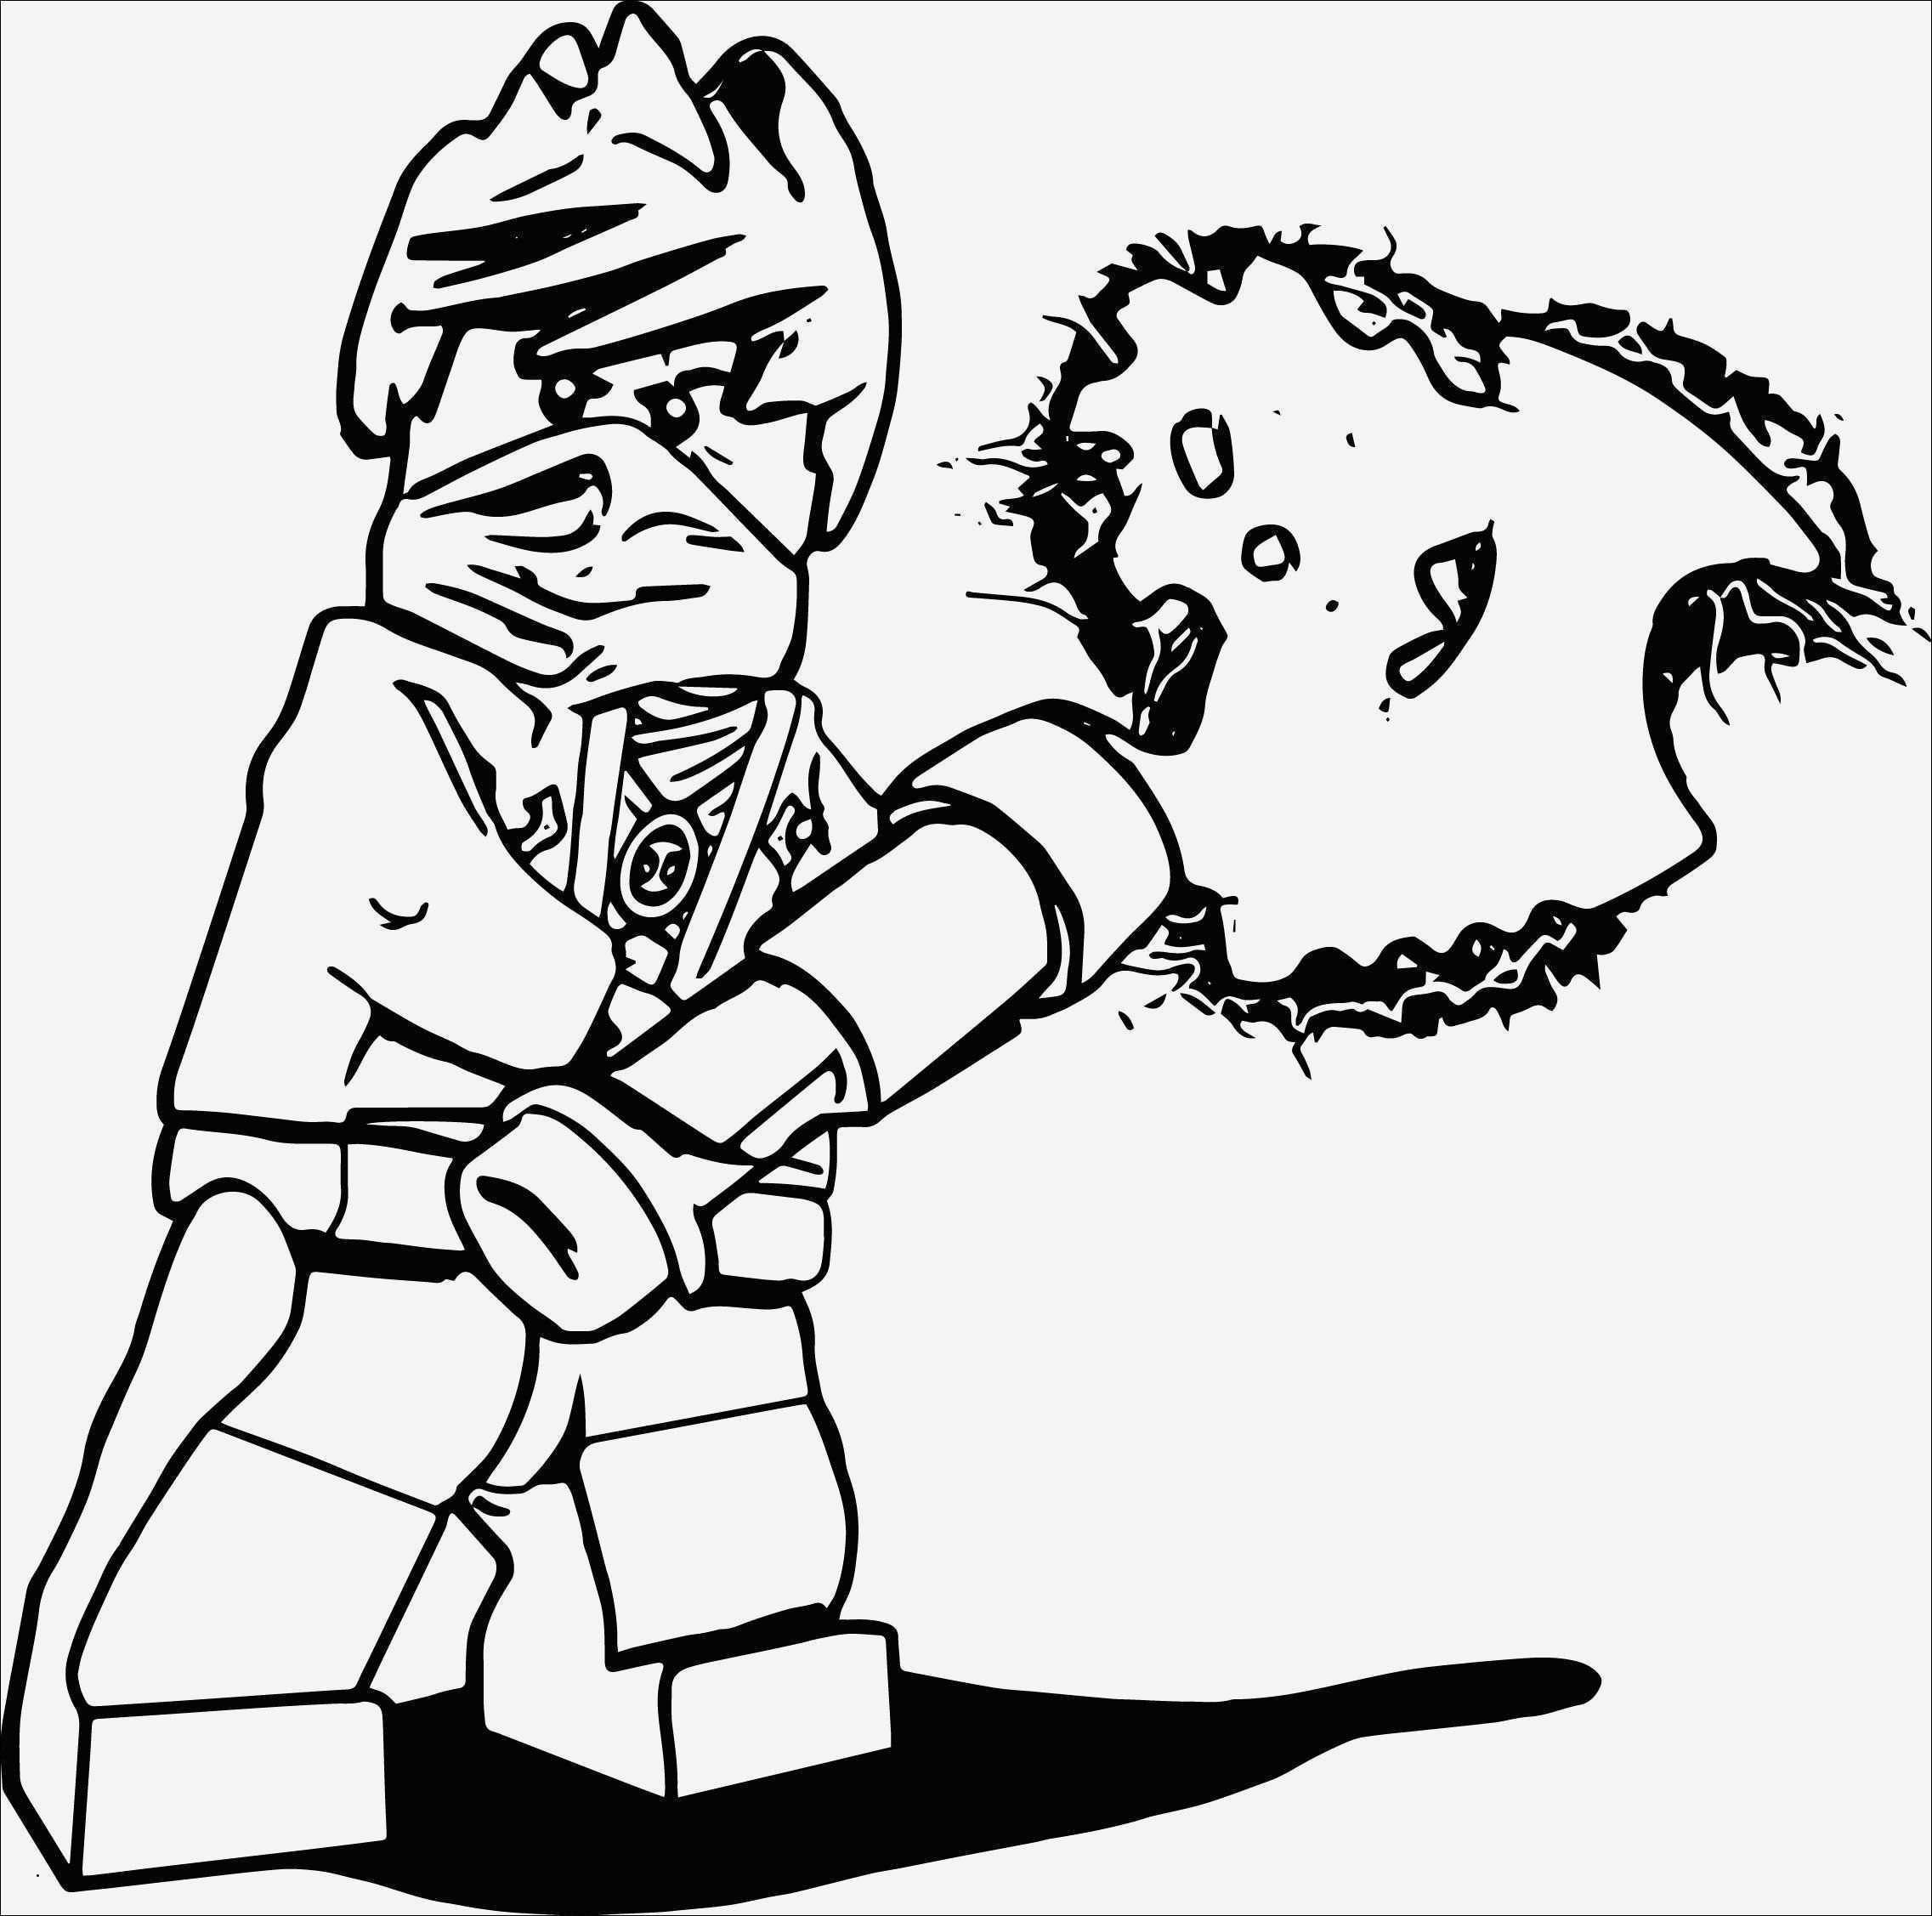 Ninjago Pythor Ausmalbilder Einzigartig 40 Genial Ausmalbilder Ninjago Zum Ausdrucken Frisch Ninjago Stock